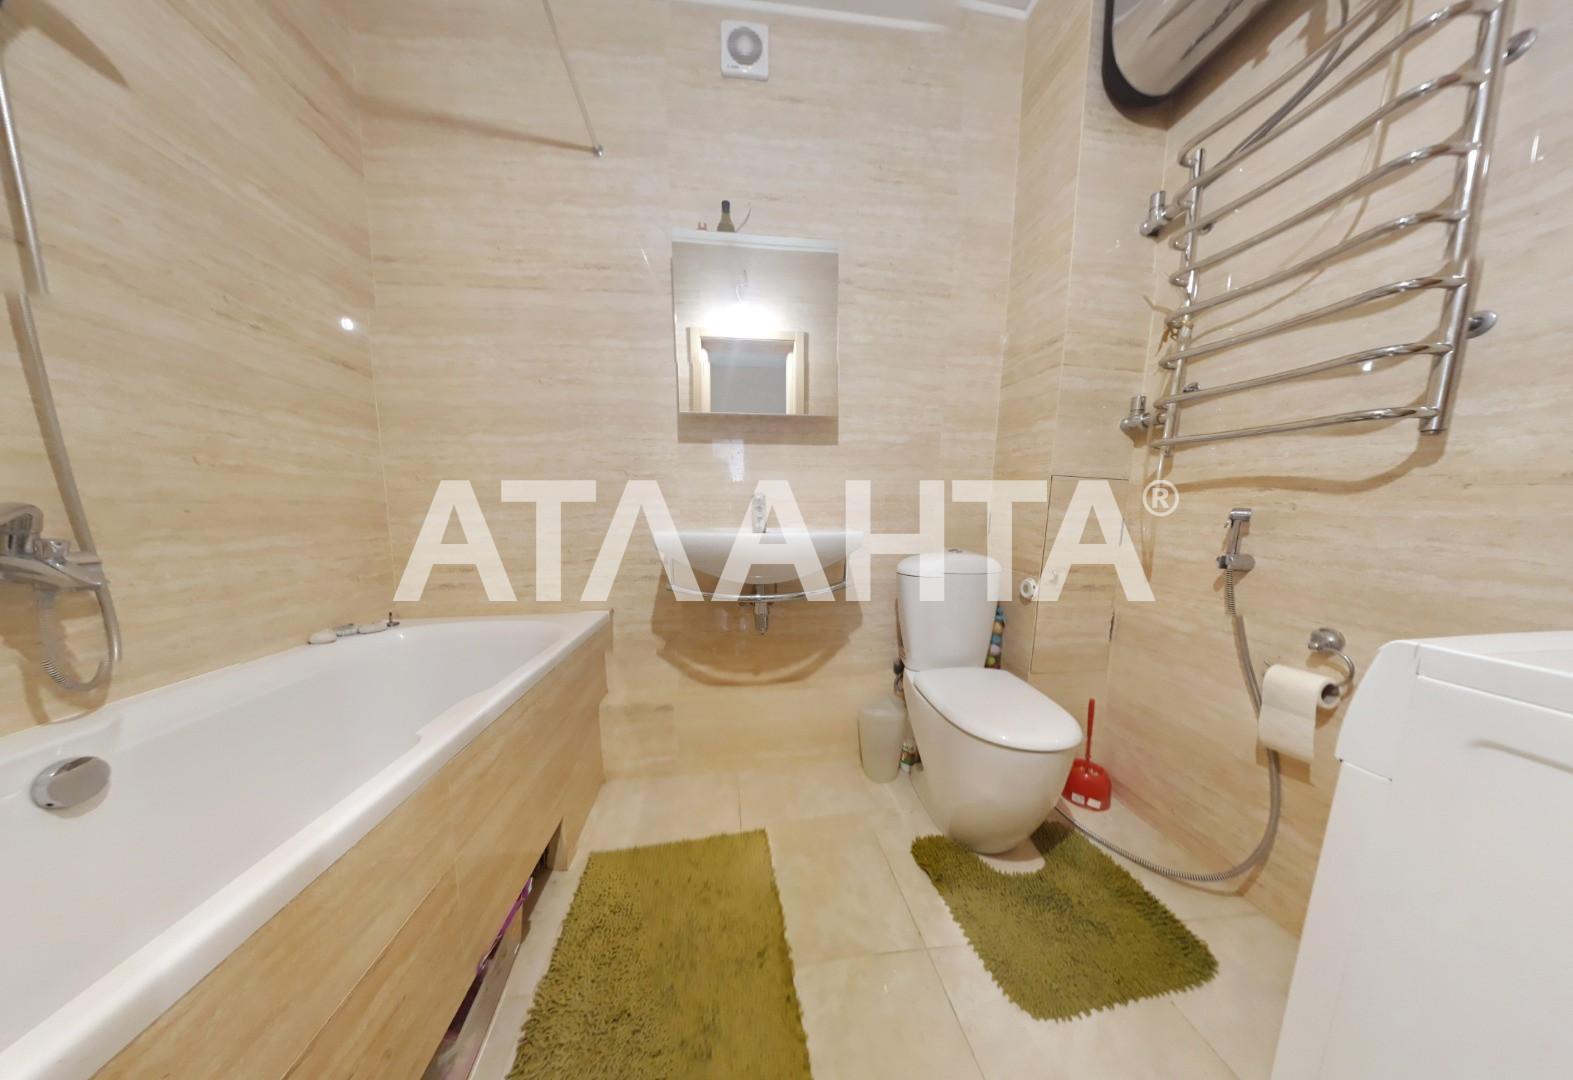 Продается 3-комнатная Квартира на ул. Ломоносова — 118 900 у.е. (фото №19)